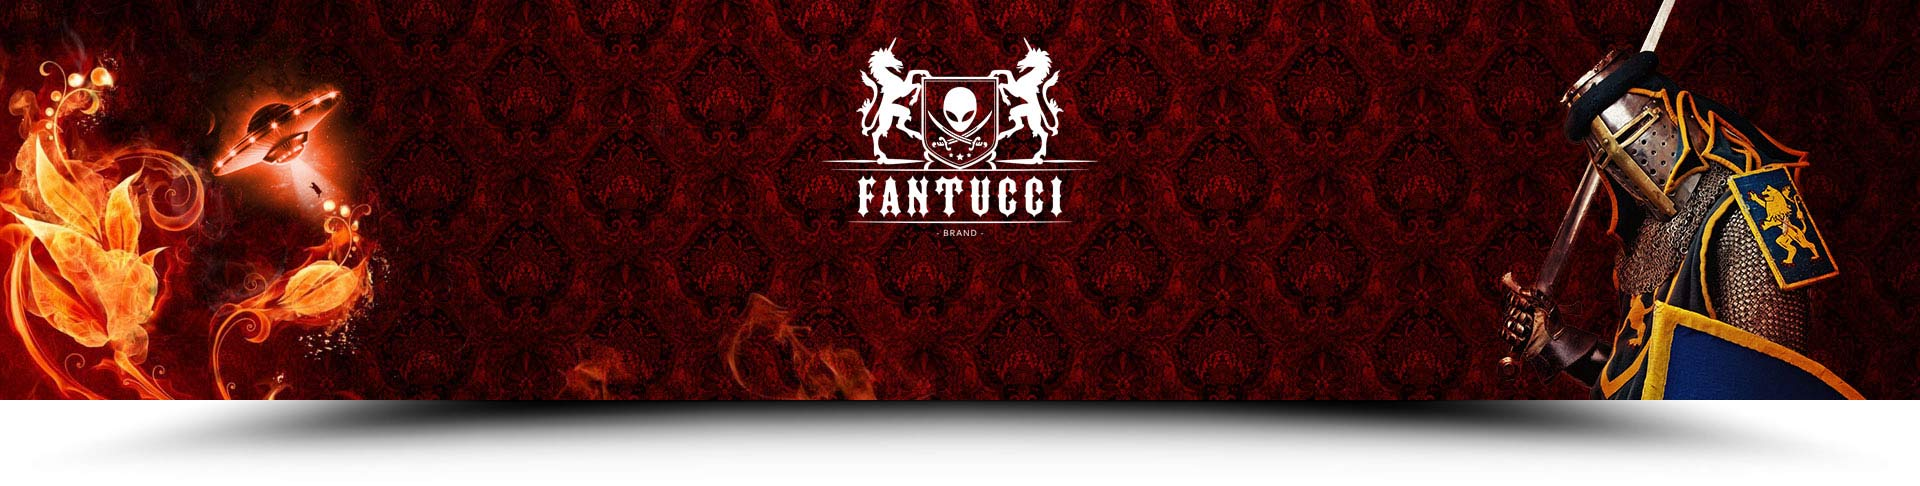 Fantucci Brand Slider 1